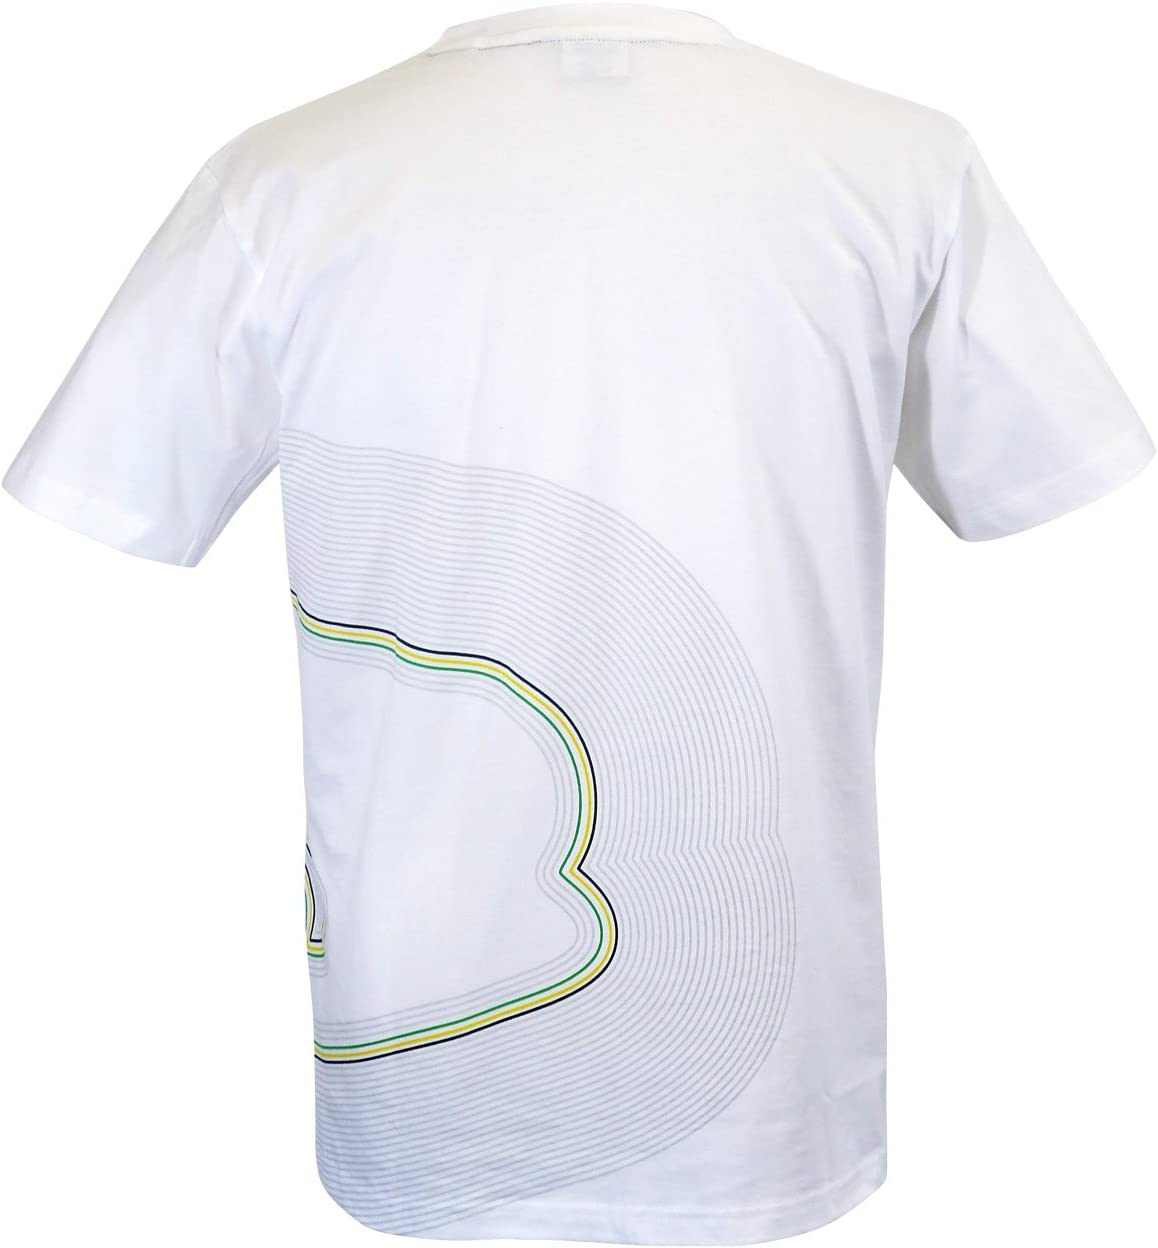 MBA-SPORT Ayrton Senna T-Shirt Track Lines